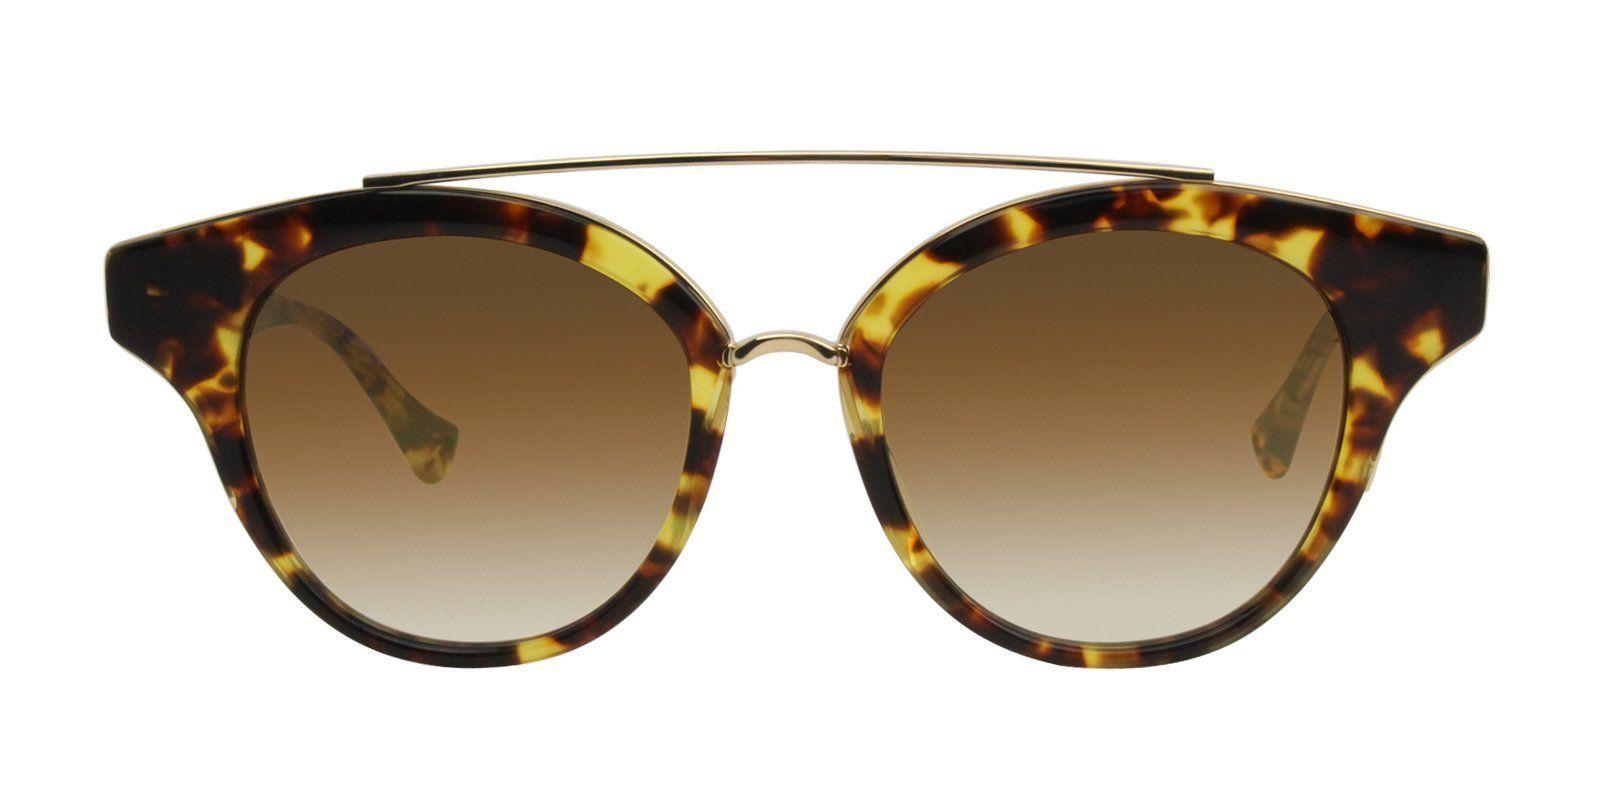 9c3b1b55c8 Dita - Medina Gold - Gold sunglasses